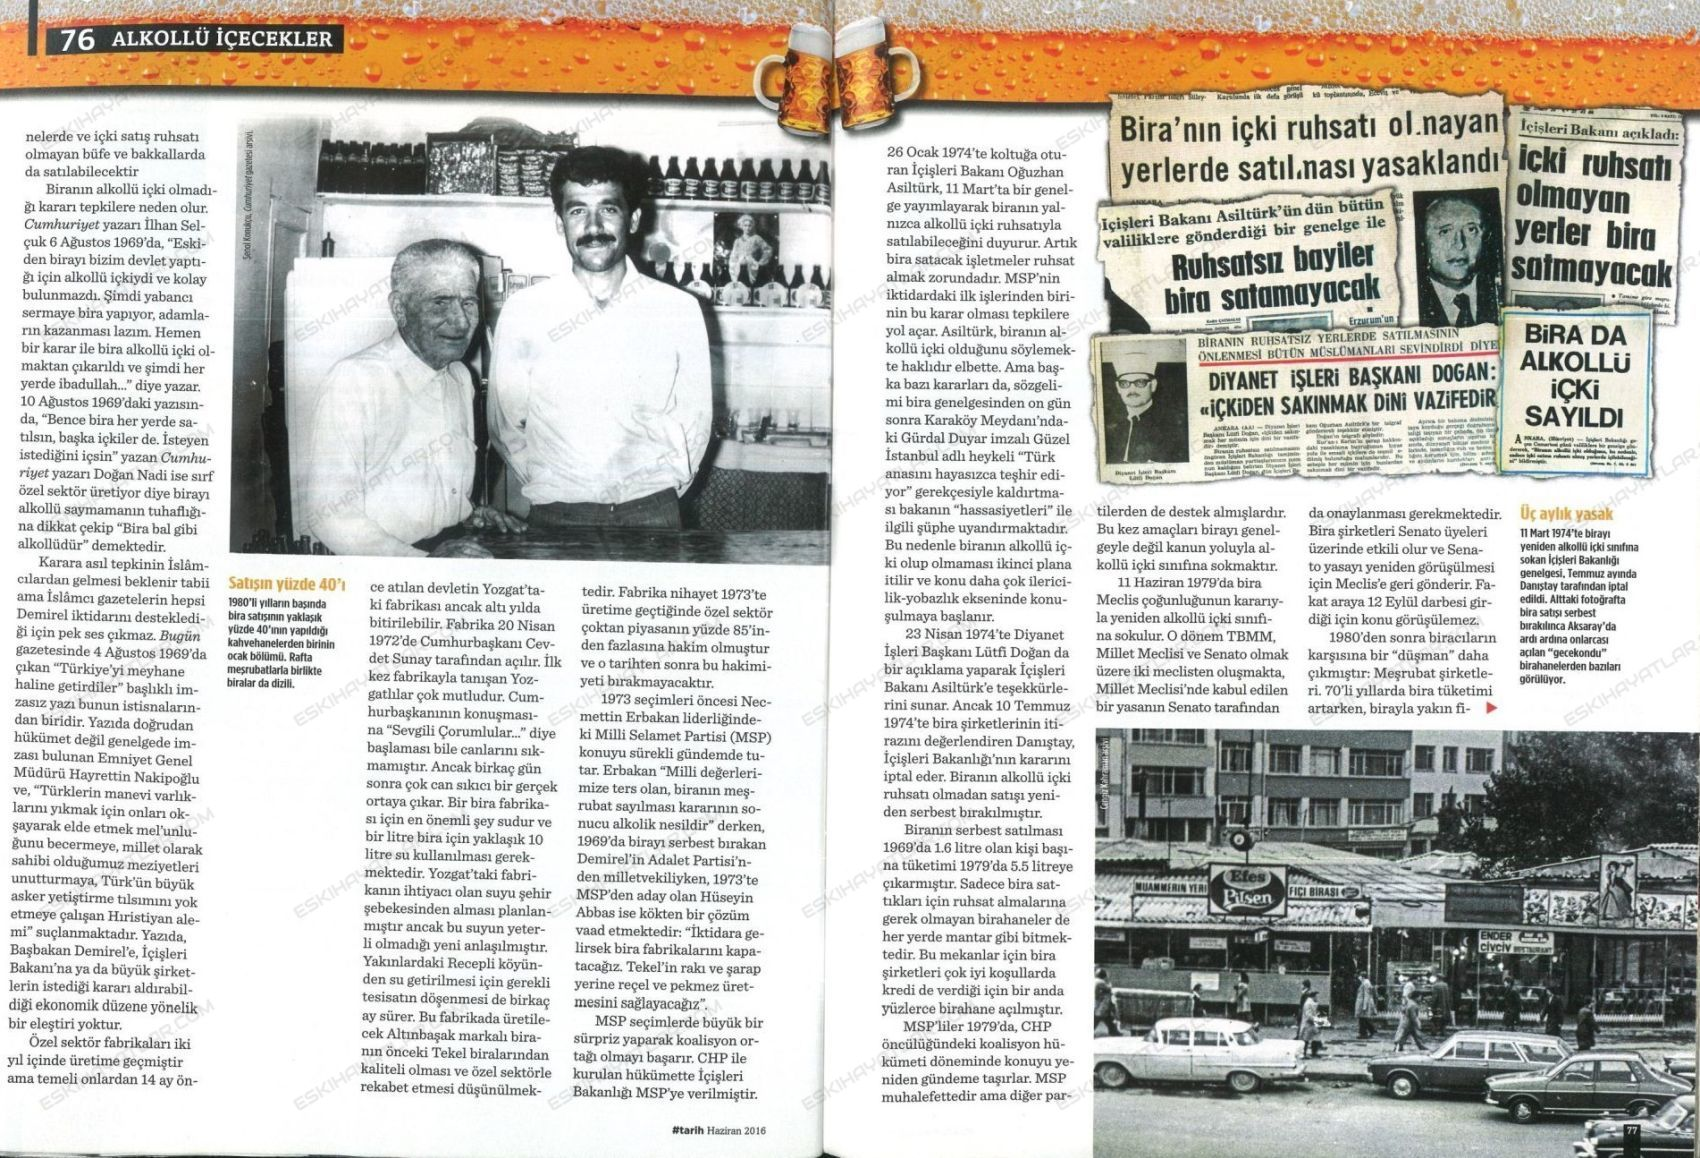 0777-biranin-kopurttugu-buyuk-kavga-1969-turk-tuborg-fabrika-kurulusu-1969-efes-pilsen-fabrika-kurulusu-bira-haberleri (3)